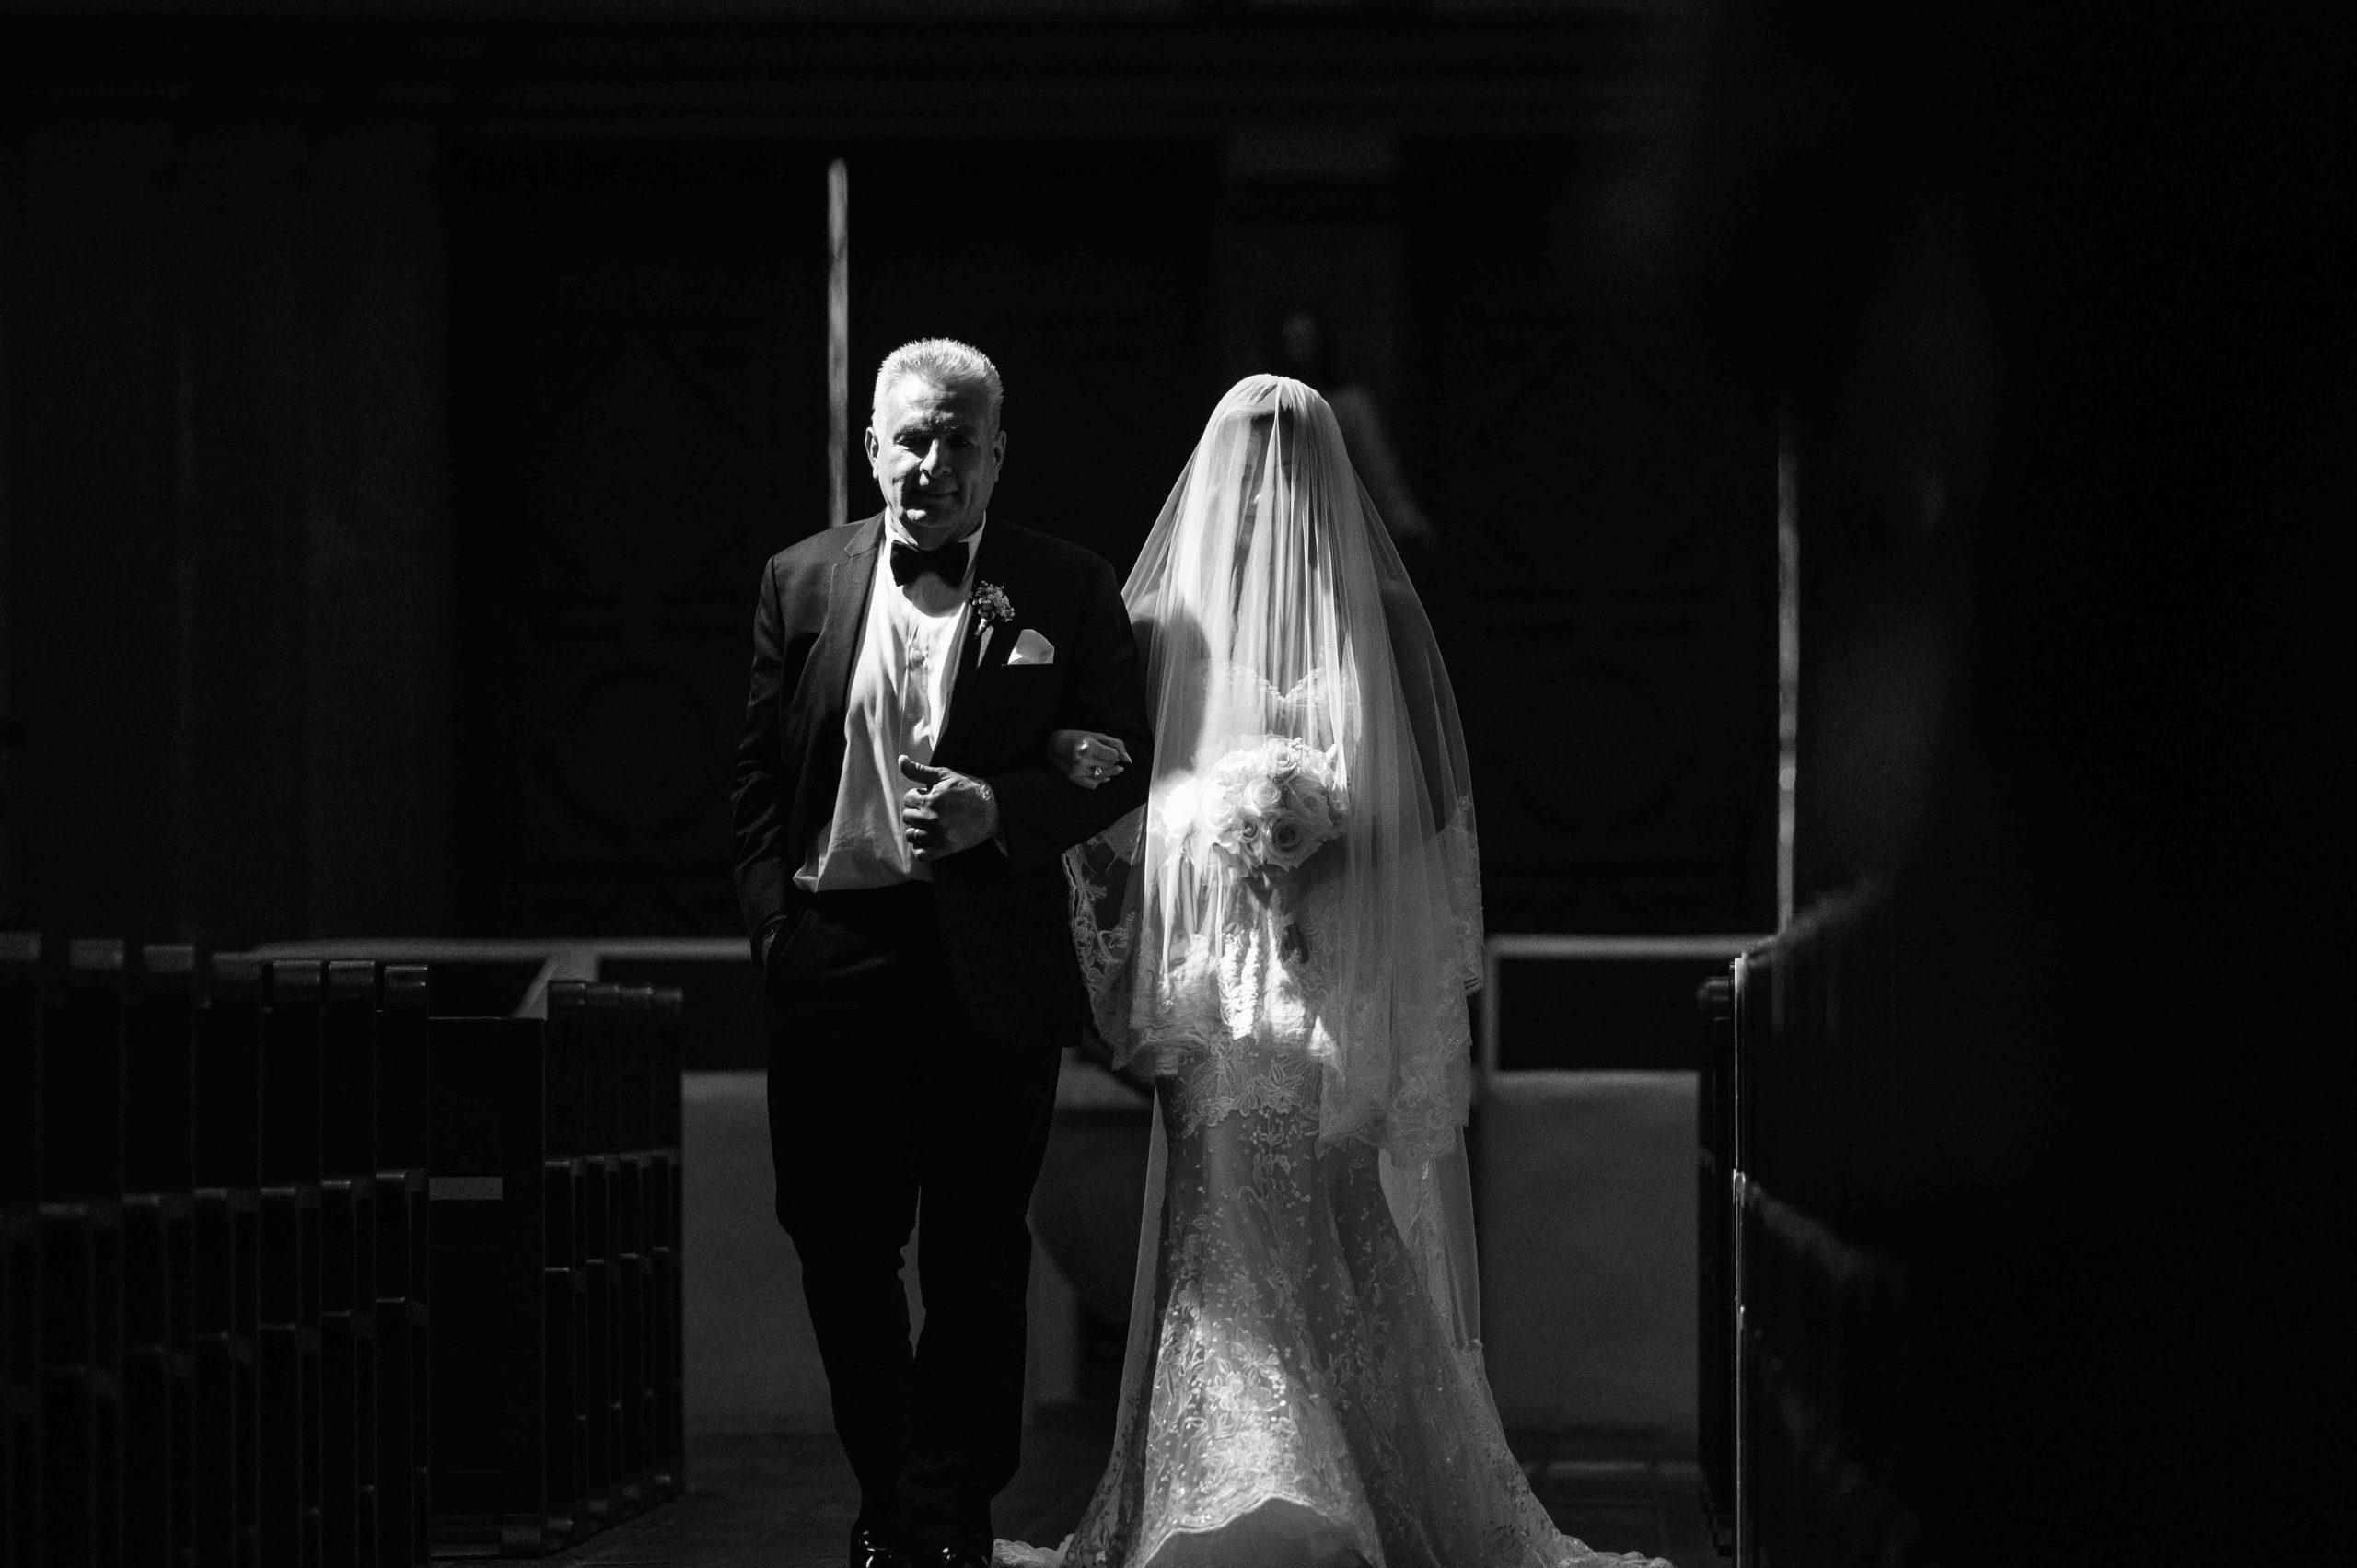 Best Wedding Photographer in Los Angeles LifeStory.Film